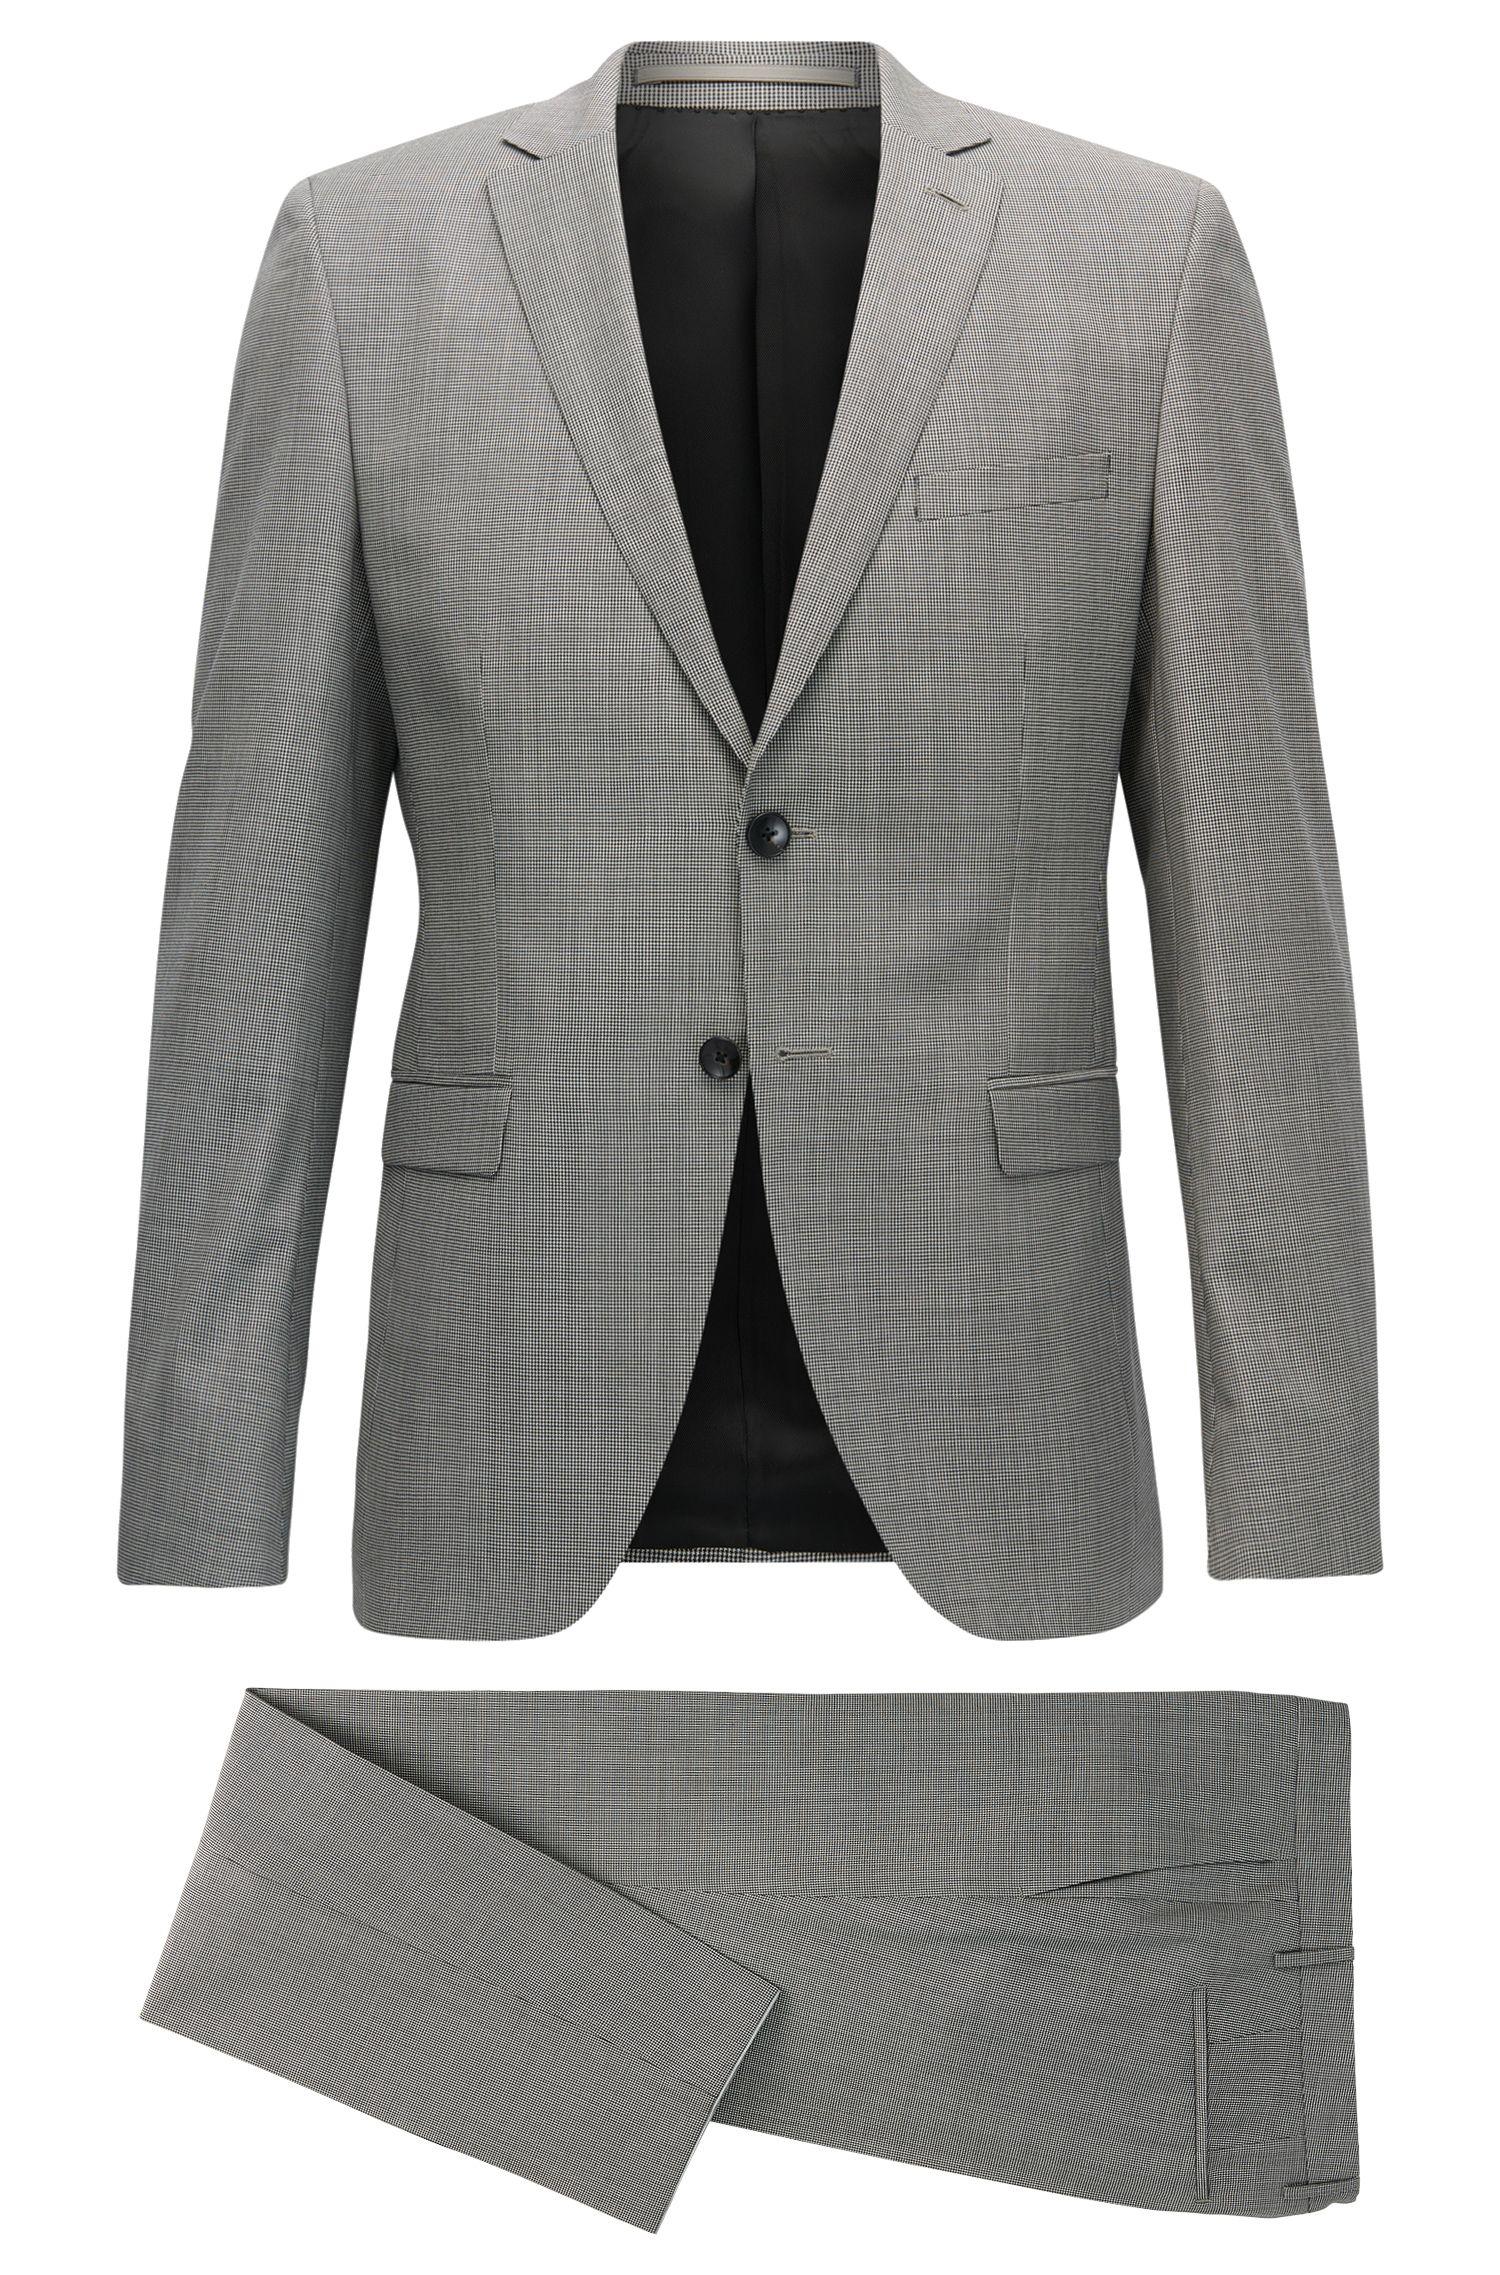 Puppytooth Virgin Wool Suit, Extra Slim Fit | Reymond/Wenton